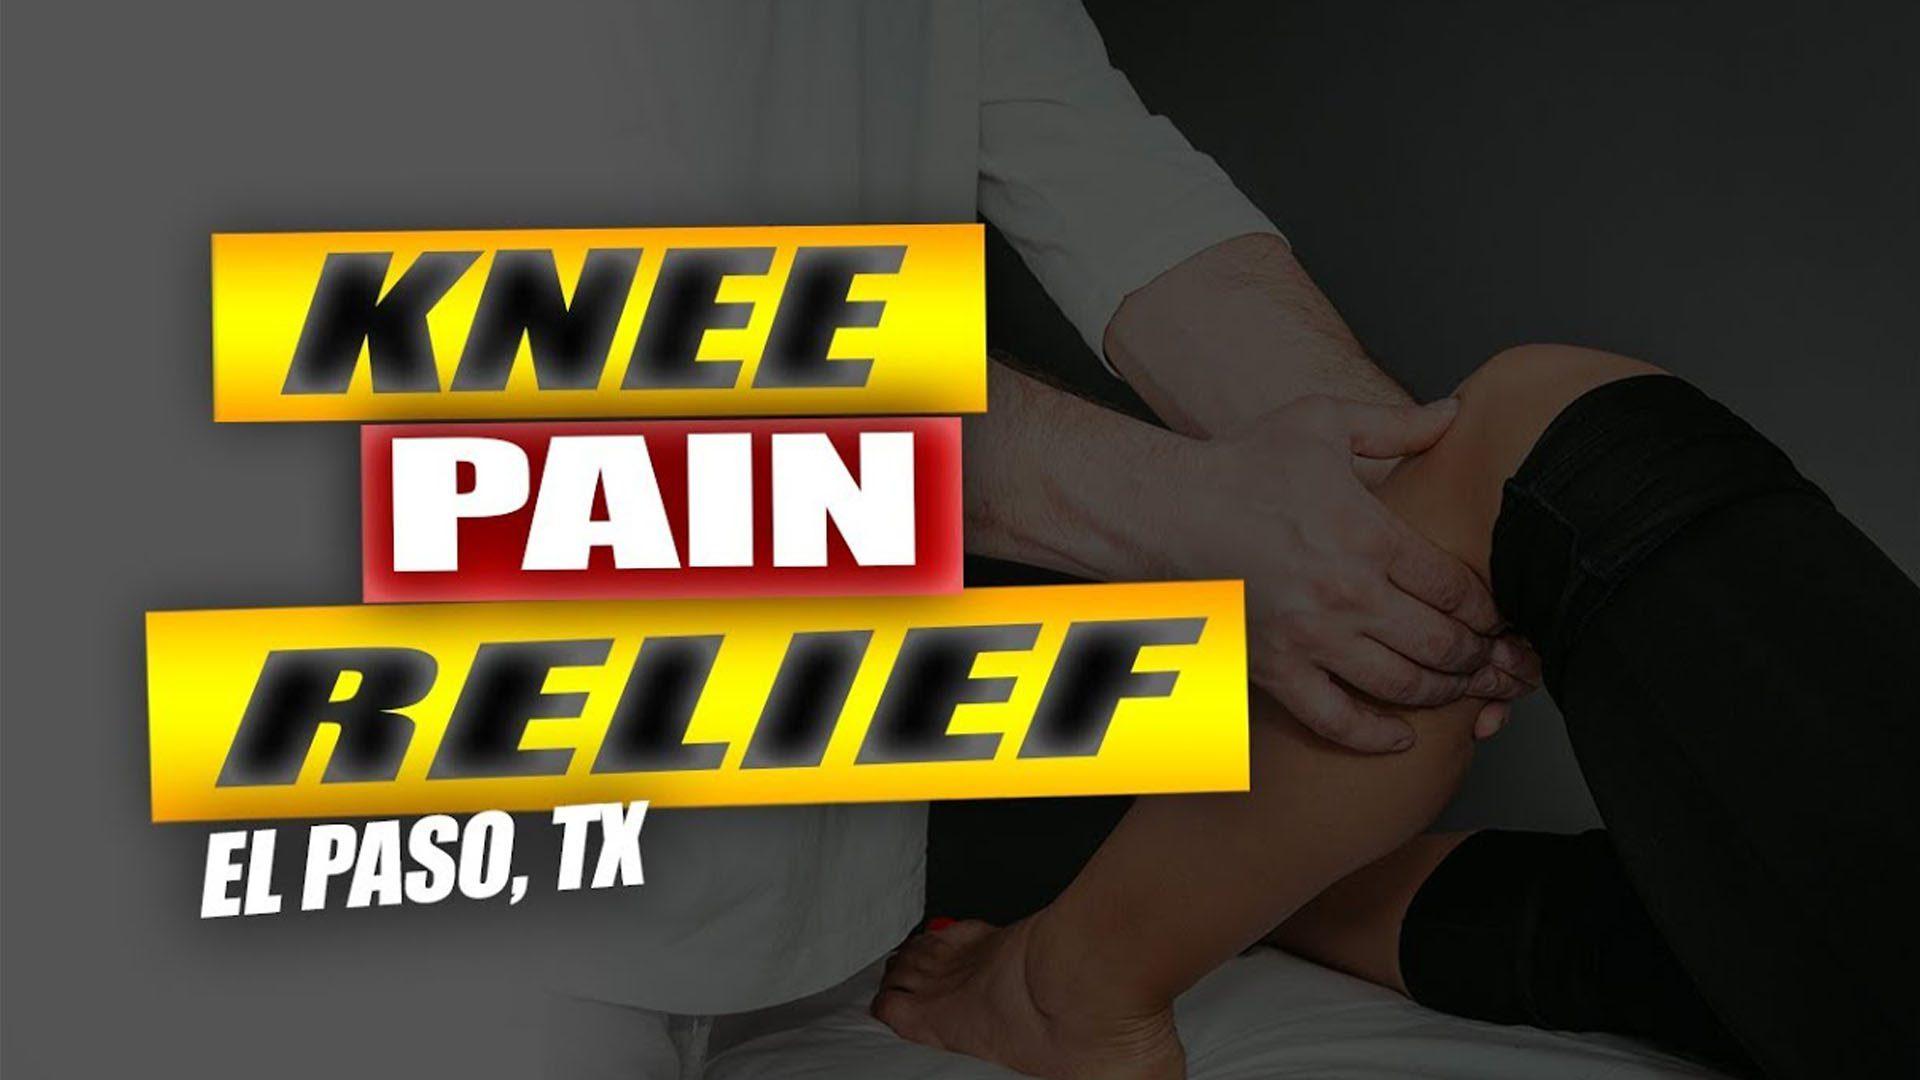 knæ smerte el paso tx.